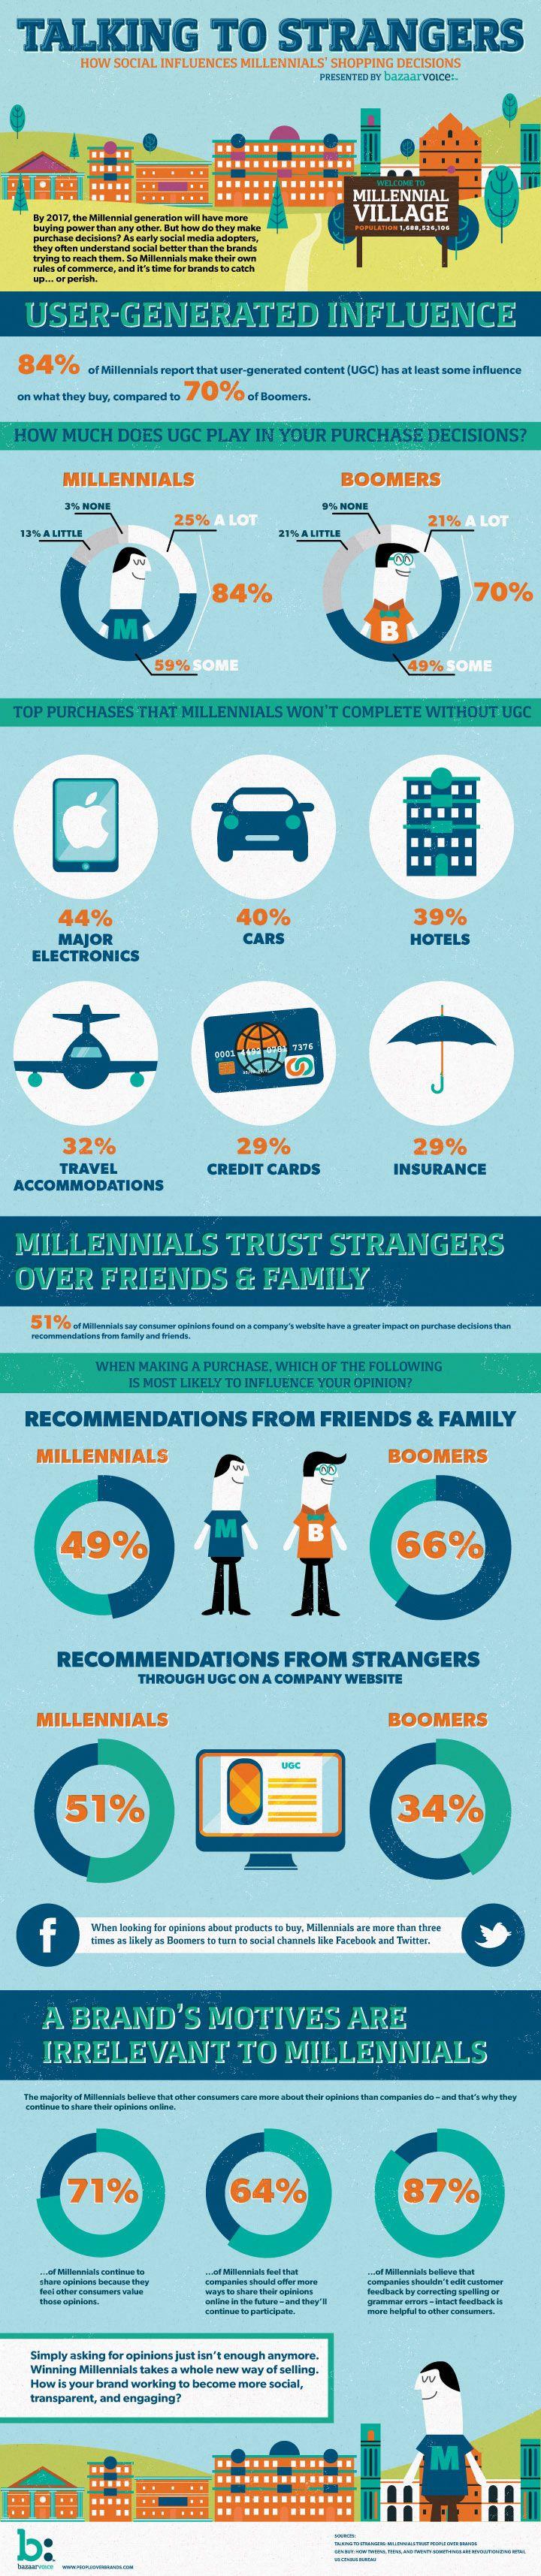 How Social Influences Millennialls' Shopping Decisions (via http://www.bazaarvoice.com/)